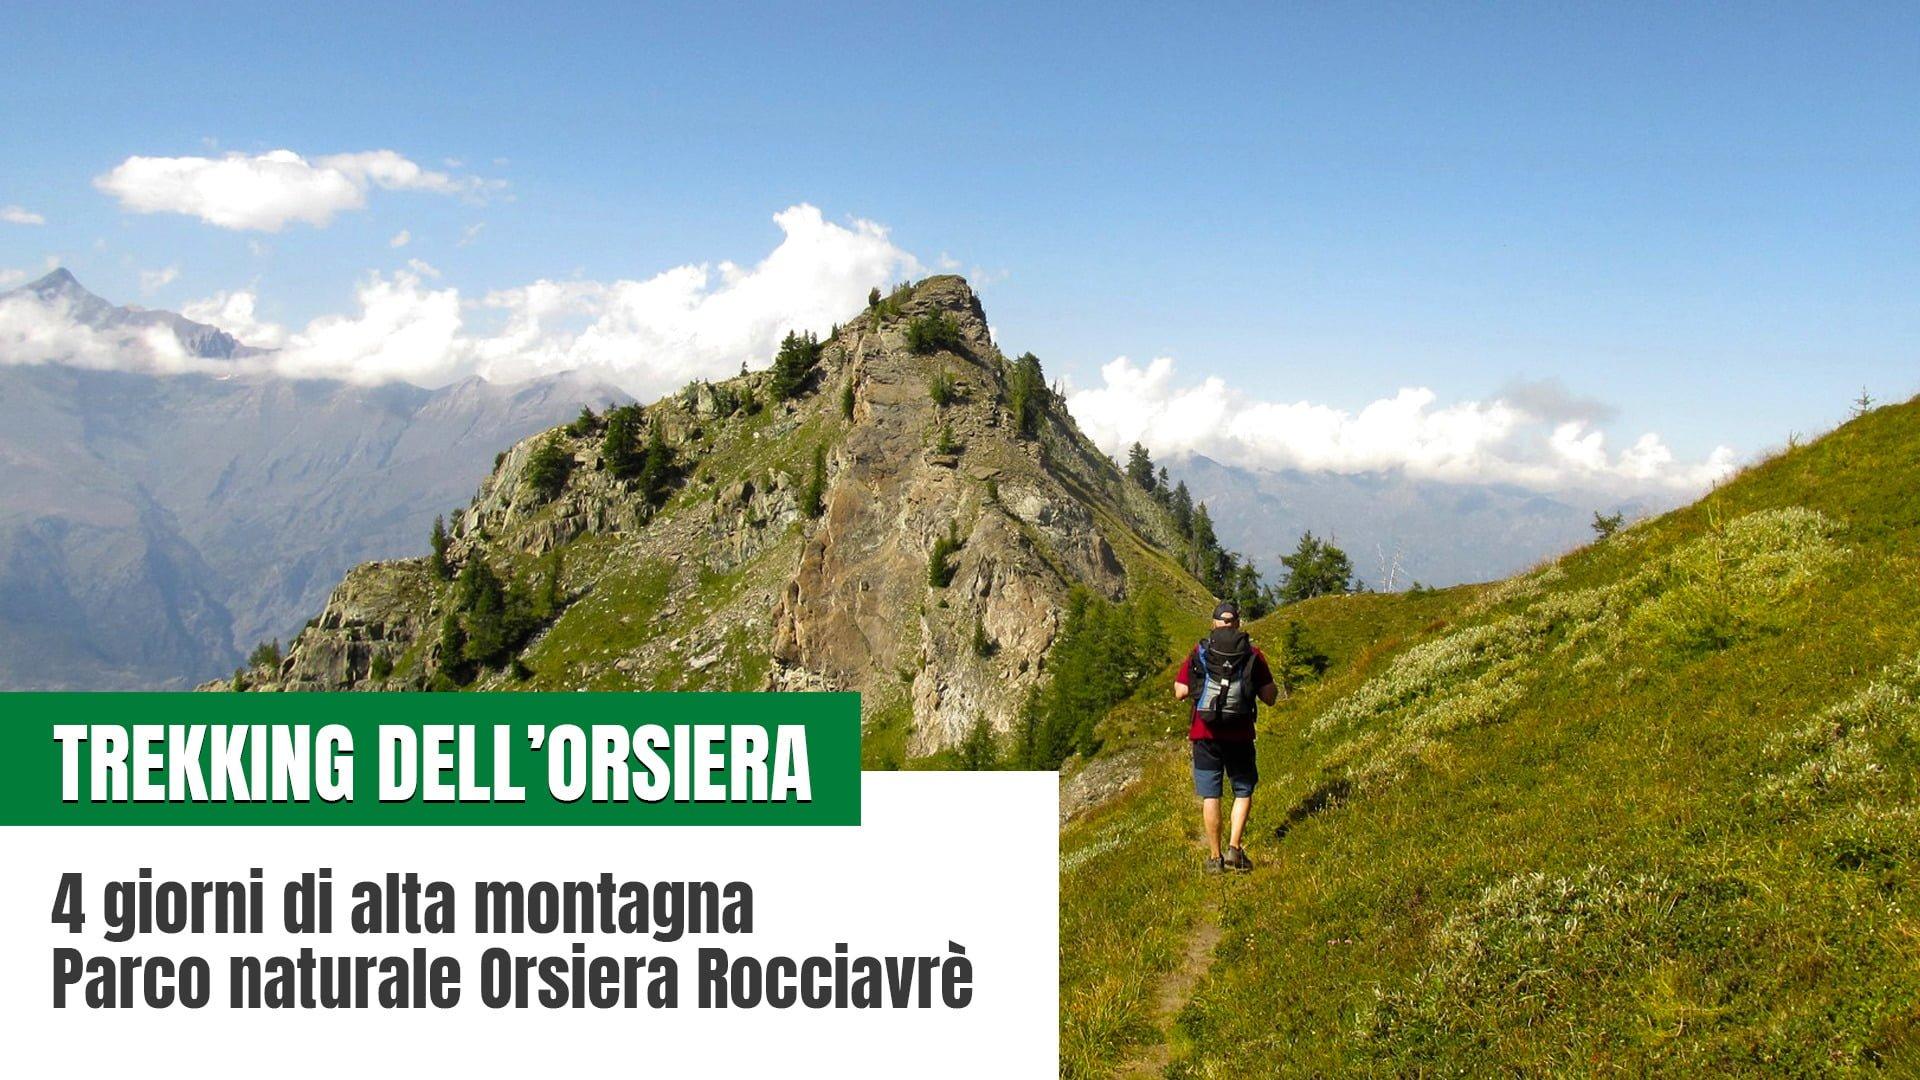 Trekking dell'Orsiera